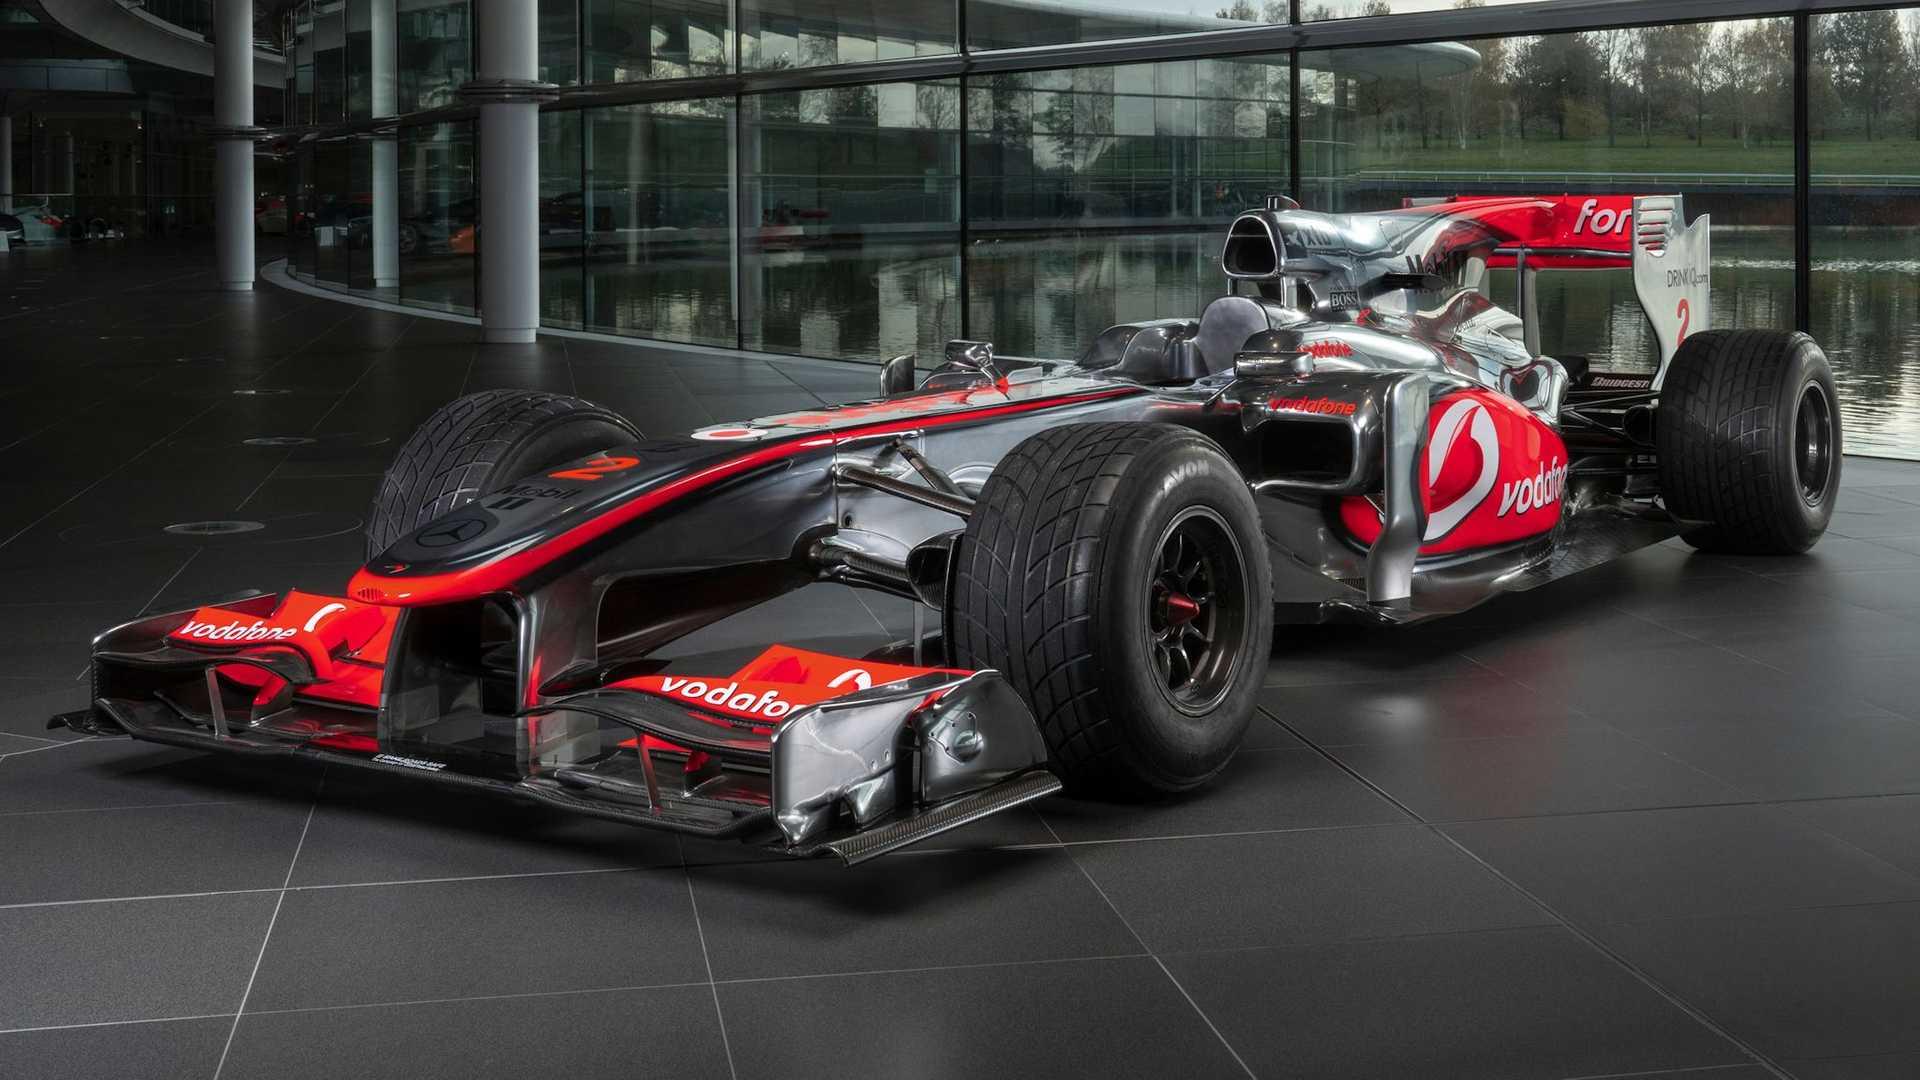 McLaren MP4-25A 01 Lewis Hamilton